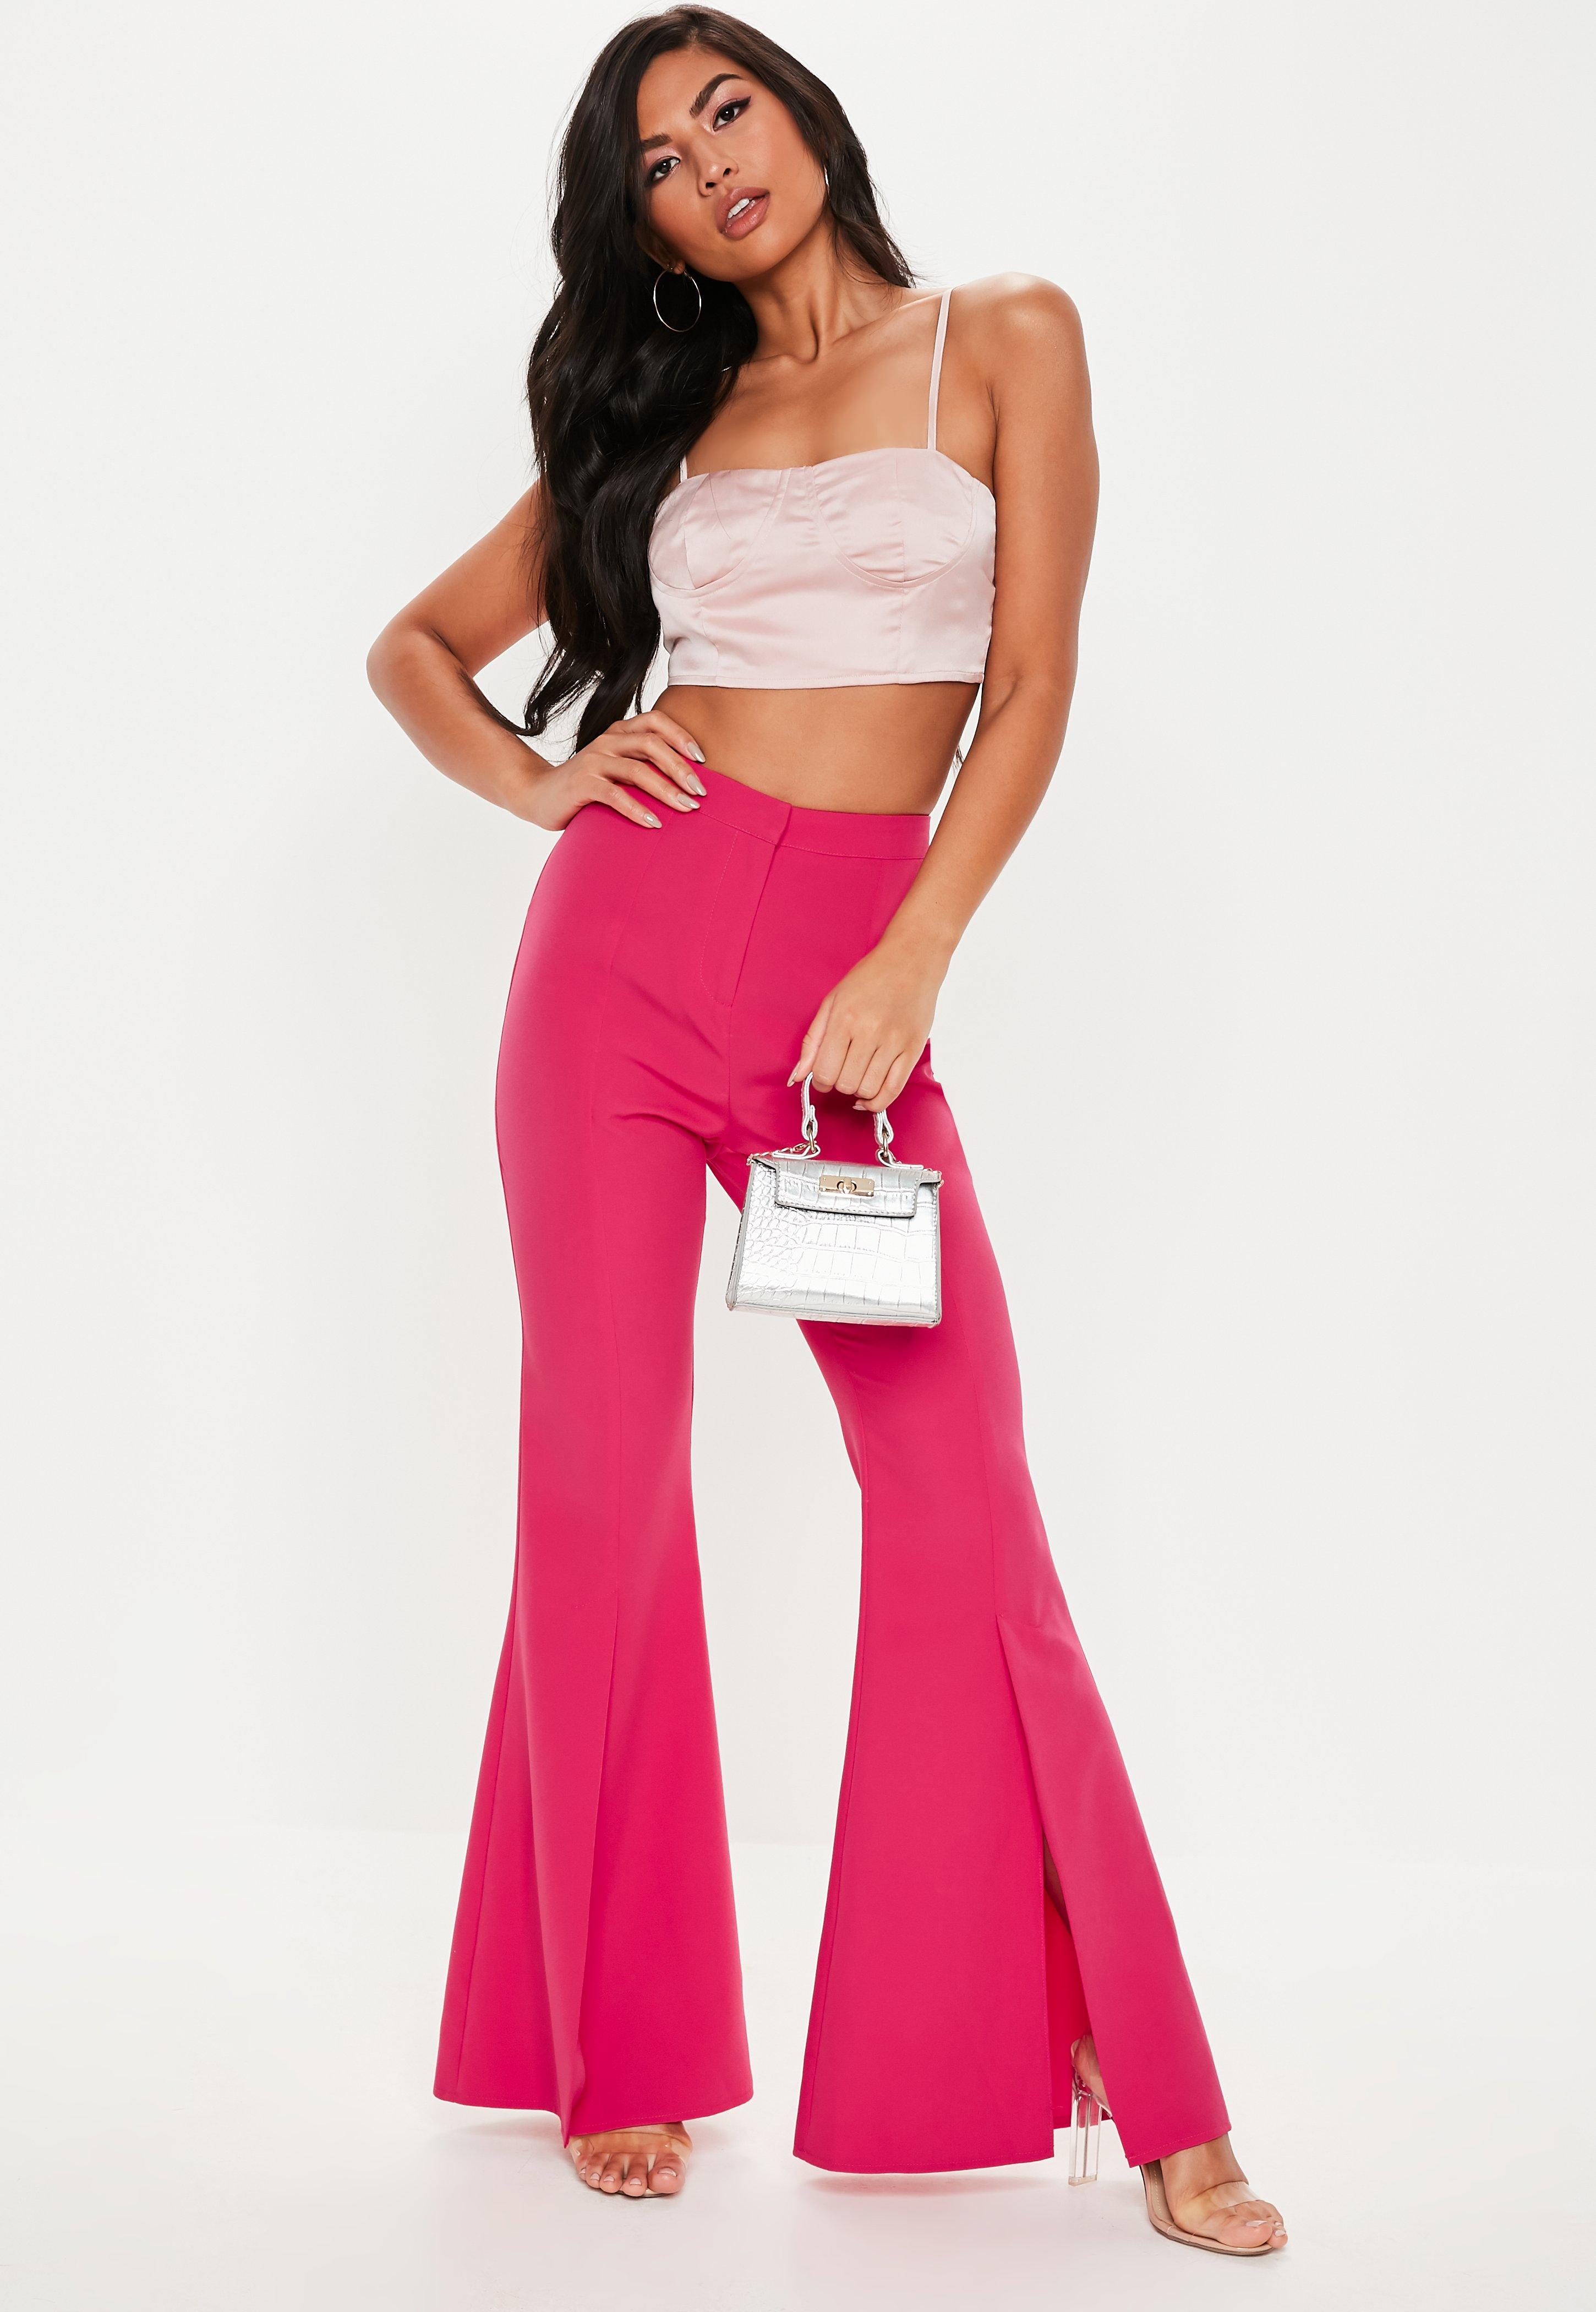 8bb488614ed9e Flare Pants - Women's Boho Flare & Ruffle Pants   Missguided